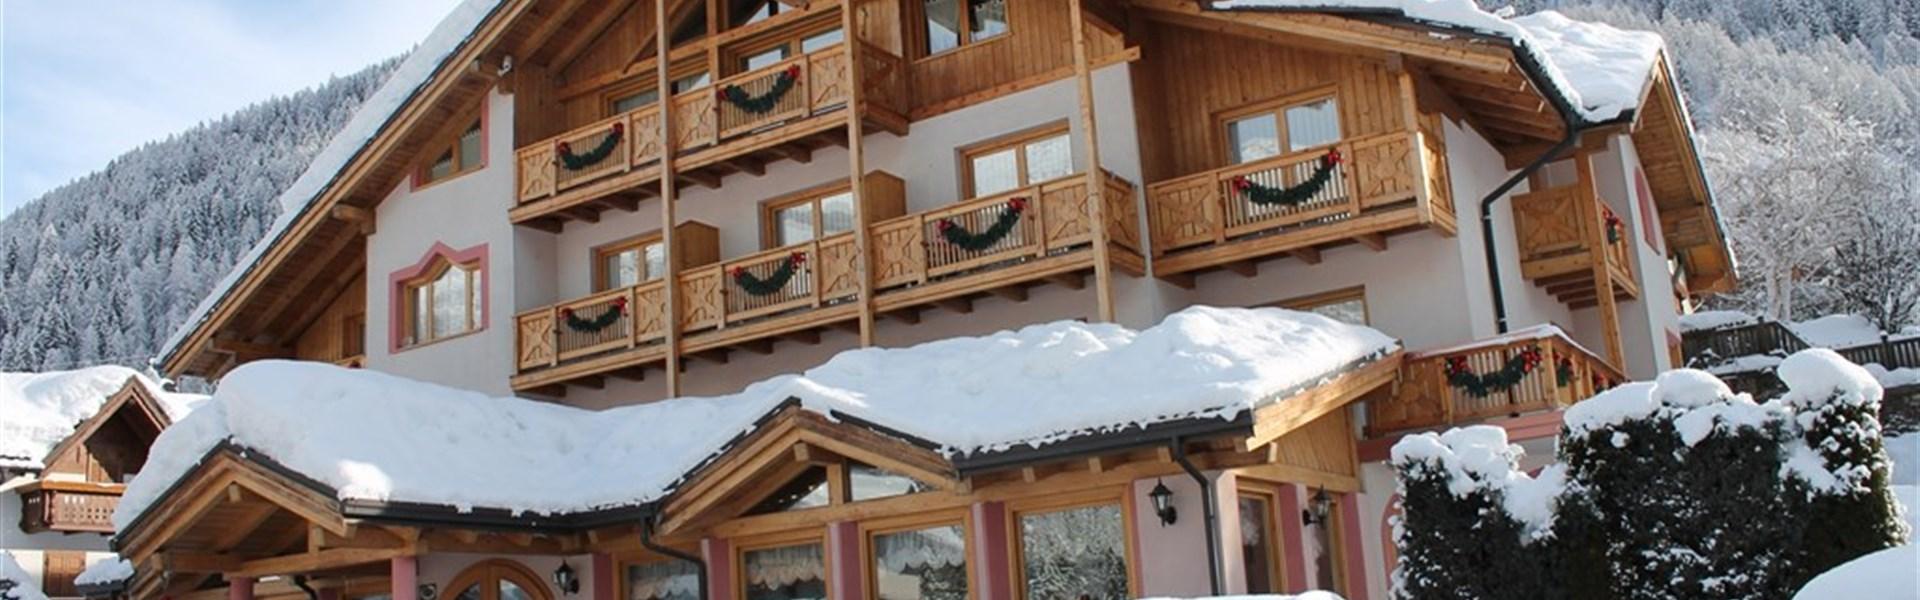 Marco Polo - Hotel Gran Zebru -